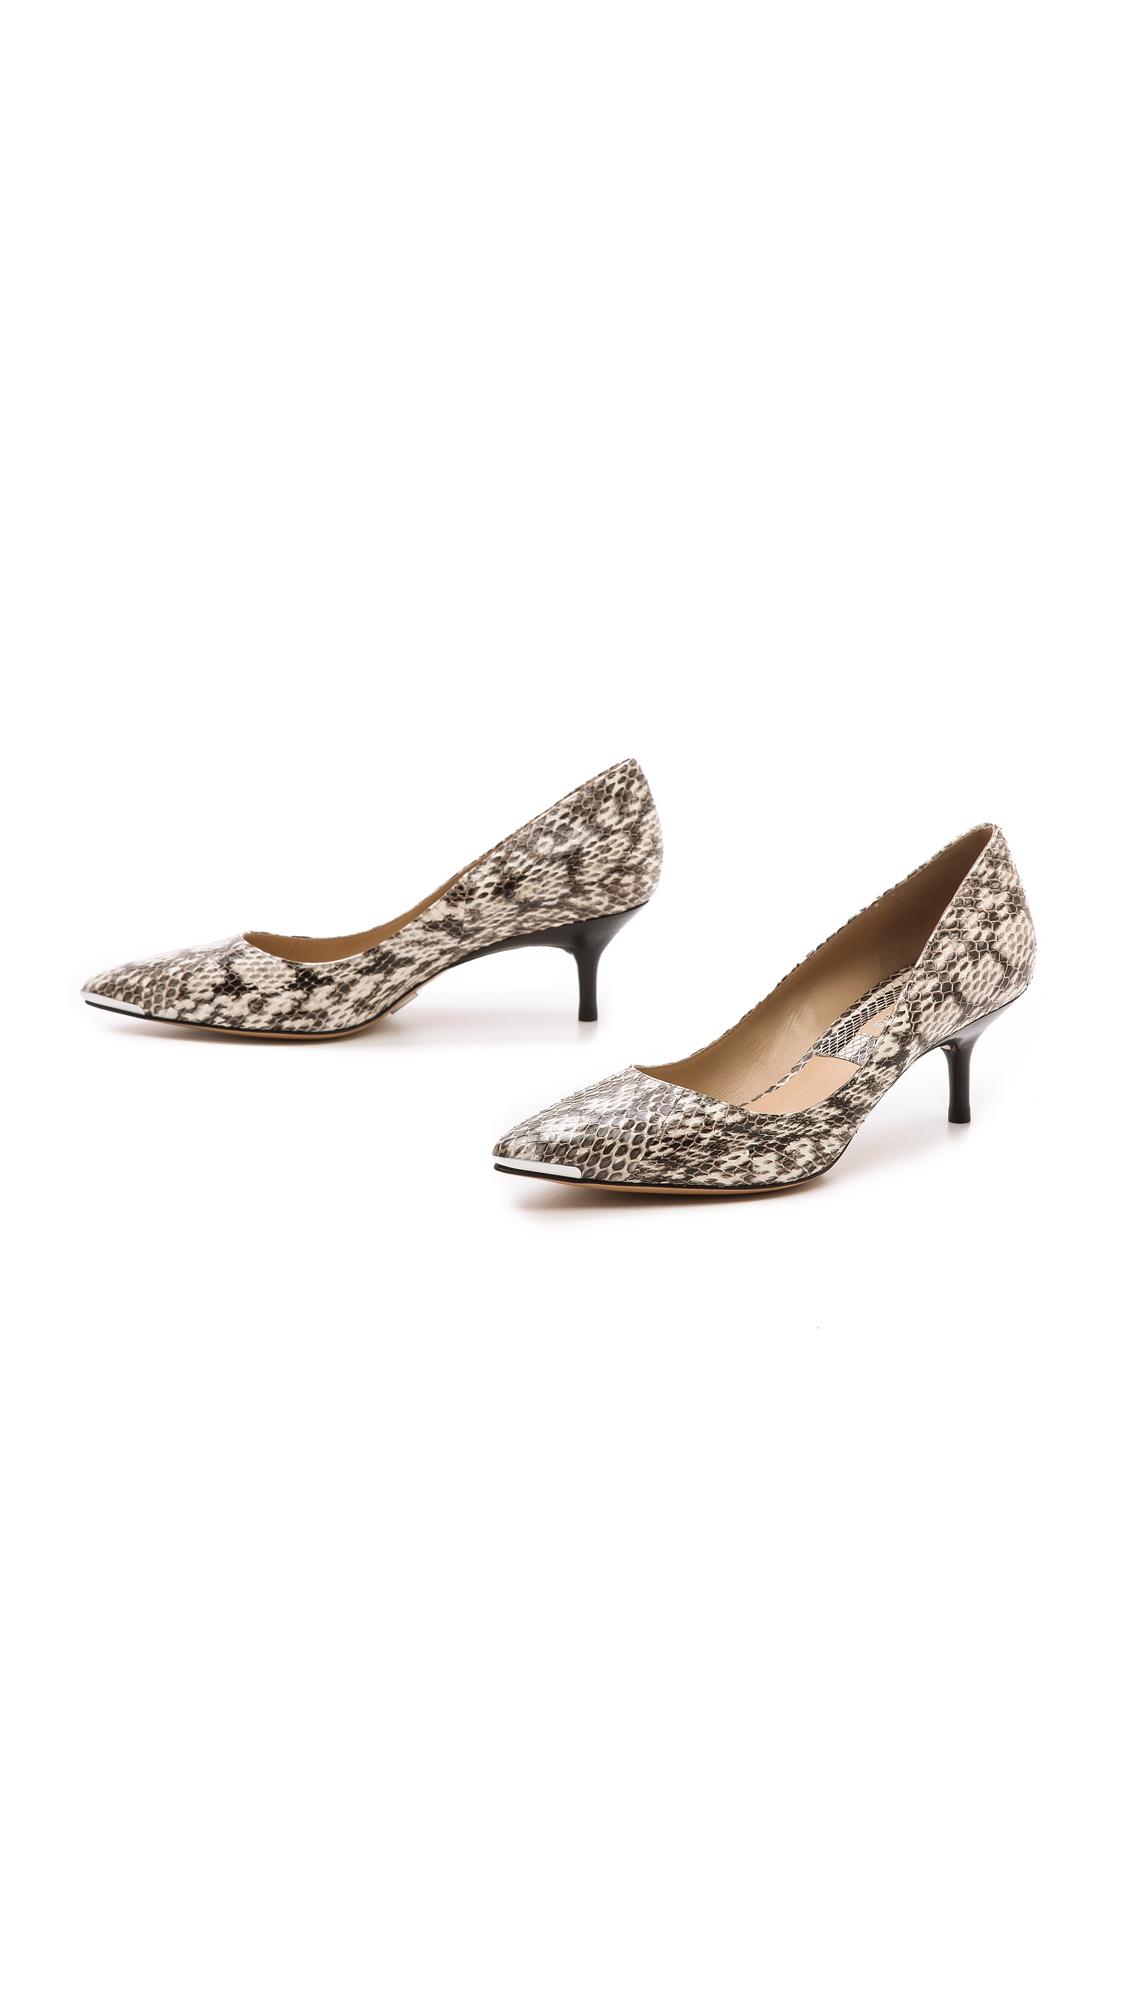 Michael kors Trisha Snakeskin Kitten Heels - Natural in Natural  Lyst